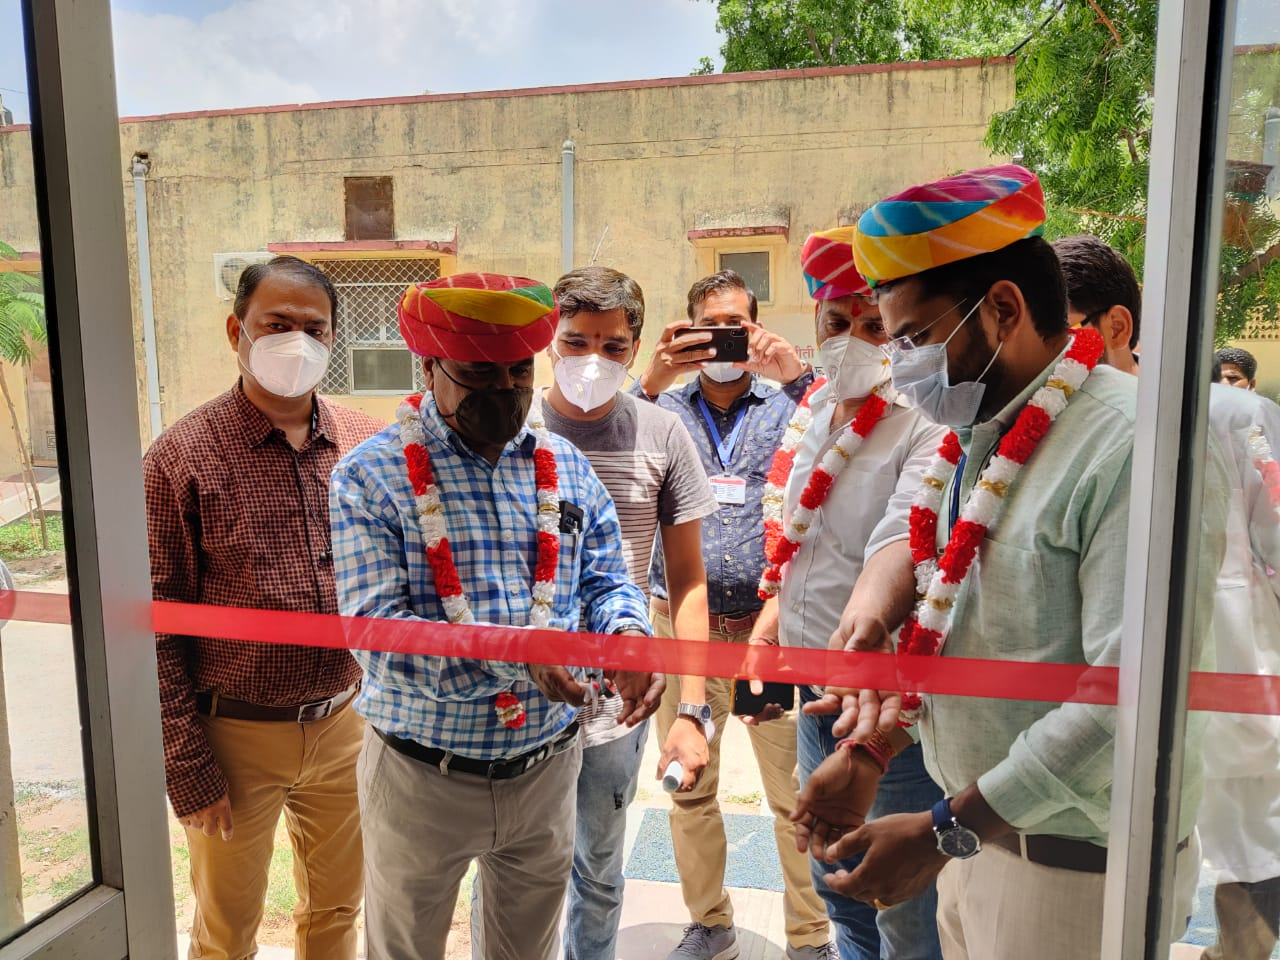 Kovid Care Center, Kelwara CHC, Wish foundation, Health Department, CoronaVirus, Rajasthan Corona News, Udaipur News, Health News, Covid Care Center Rajasthan,